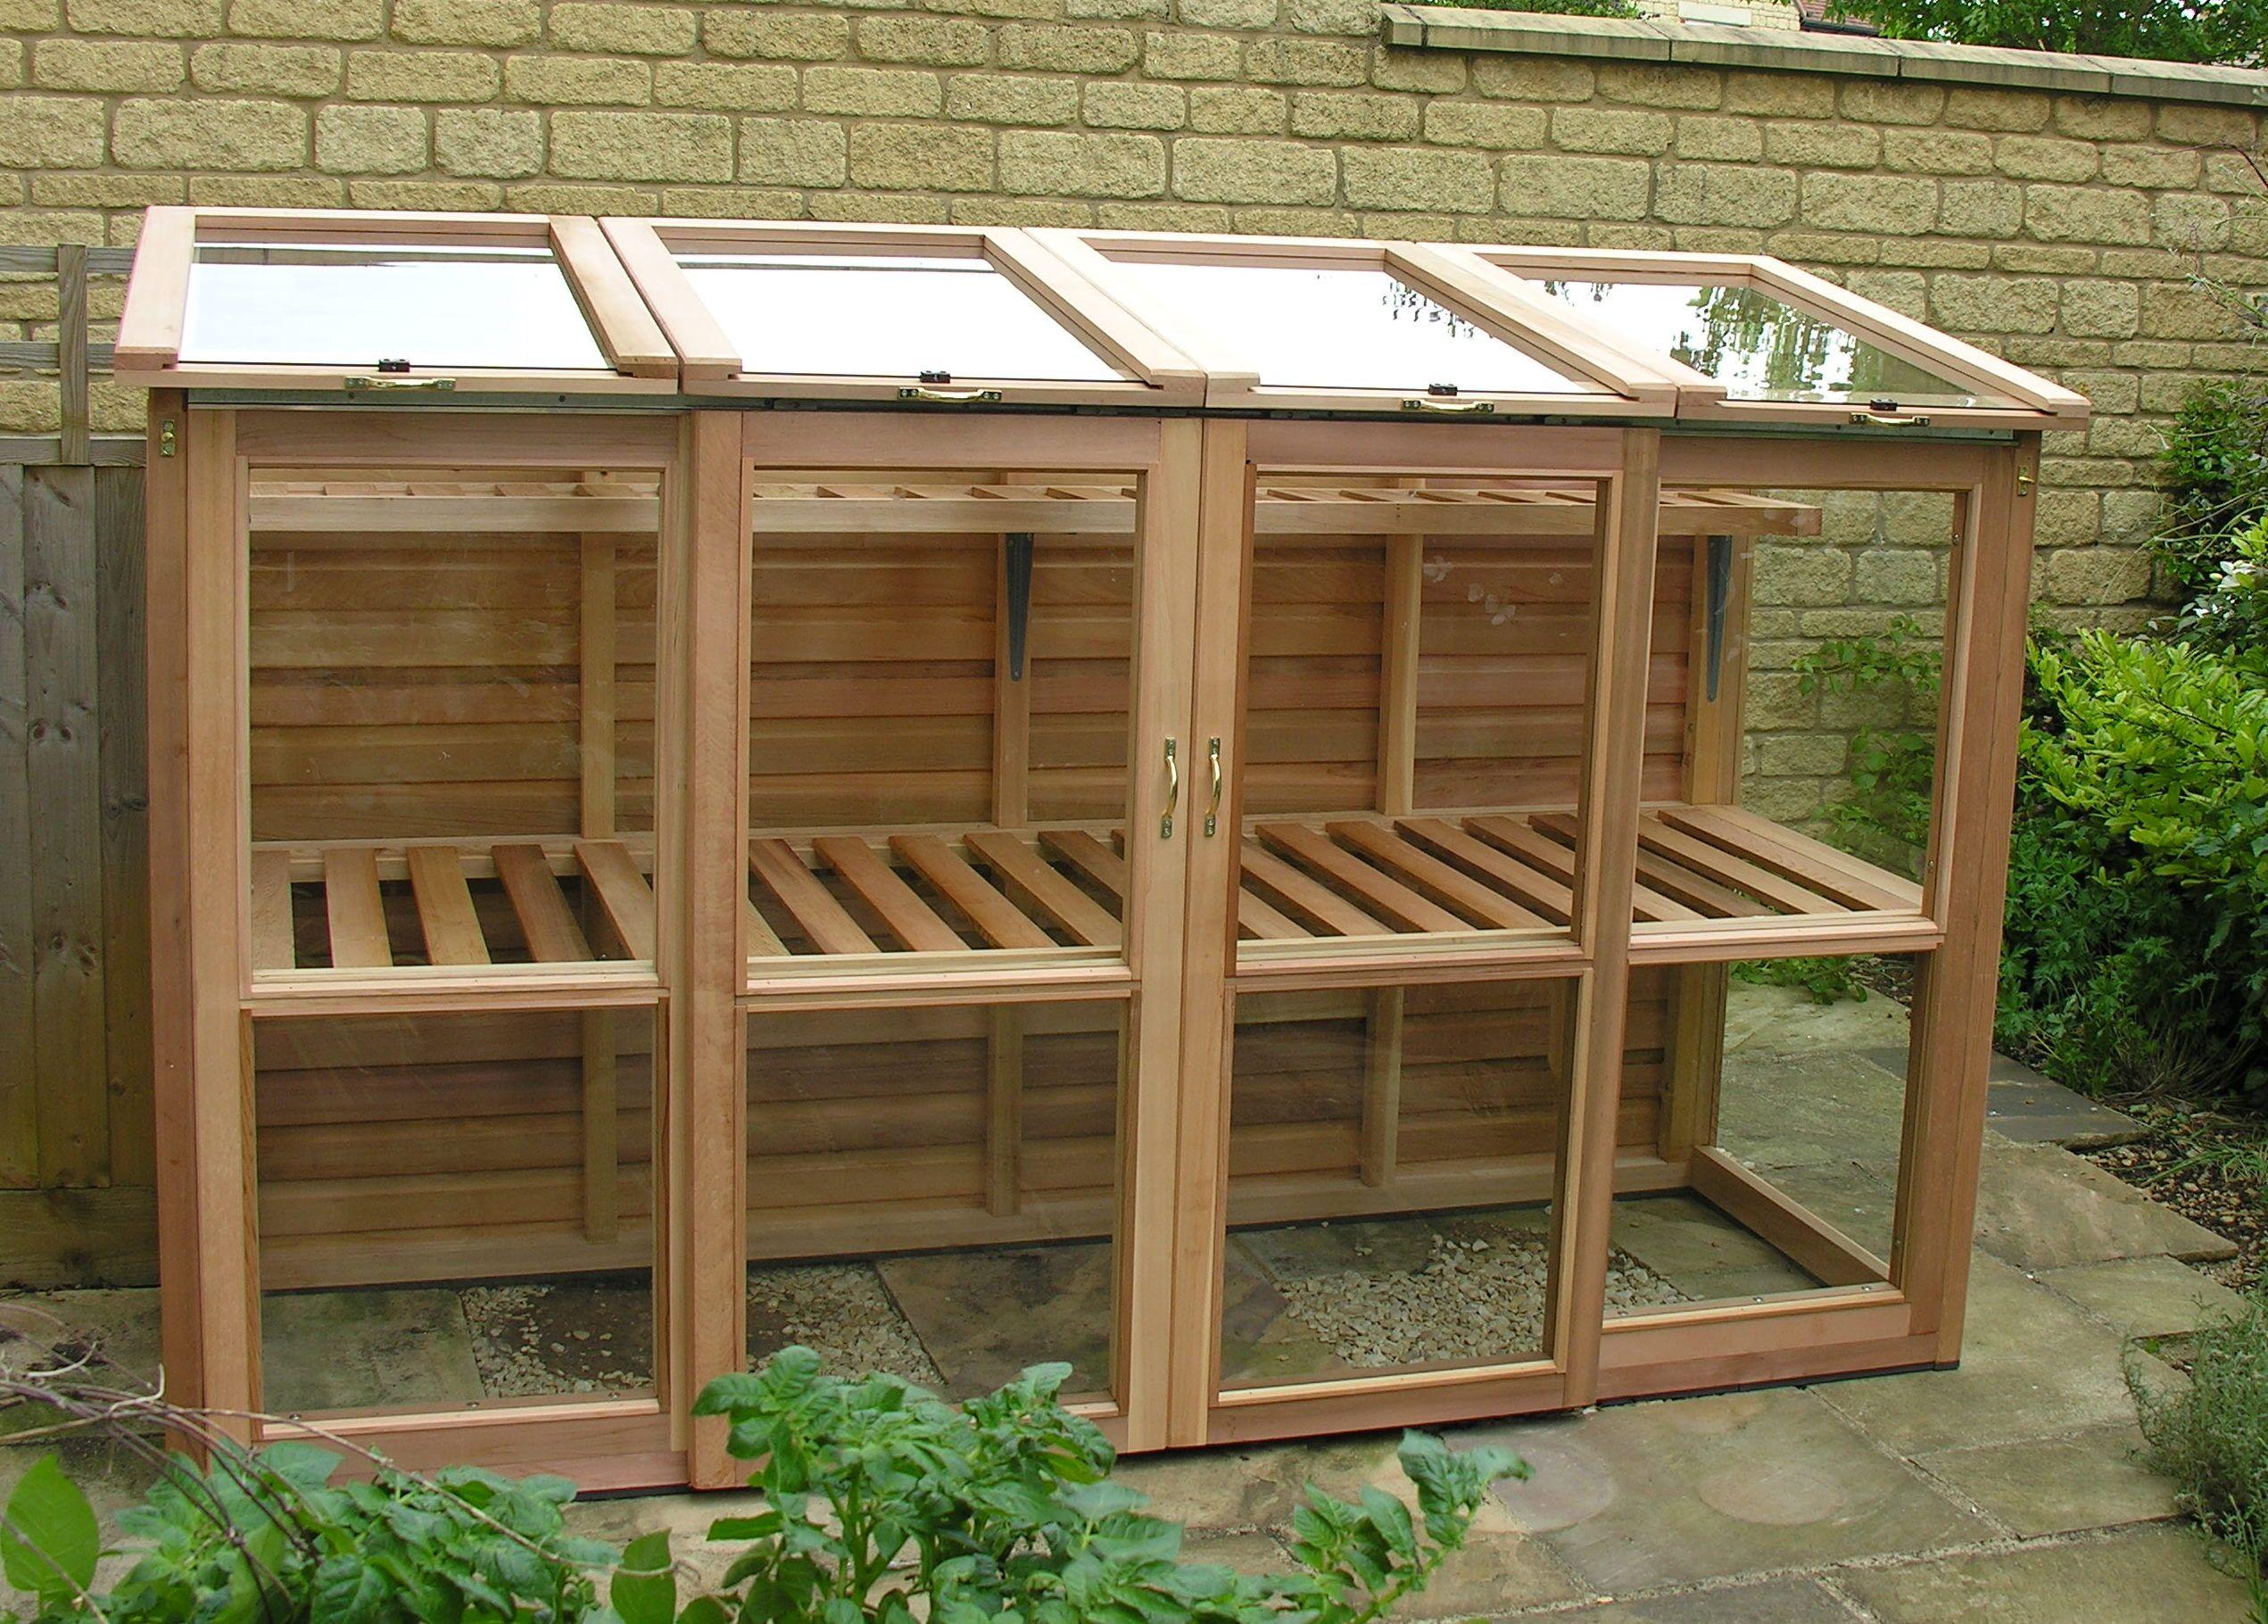 greenhouses at bramshall staffordshire england. Black Bedroom Furniture Sets. Home Design Ideas